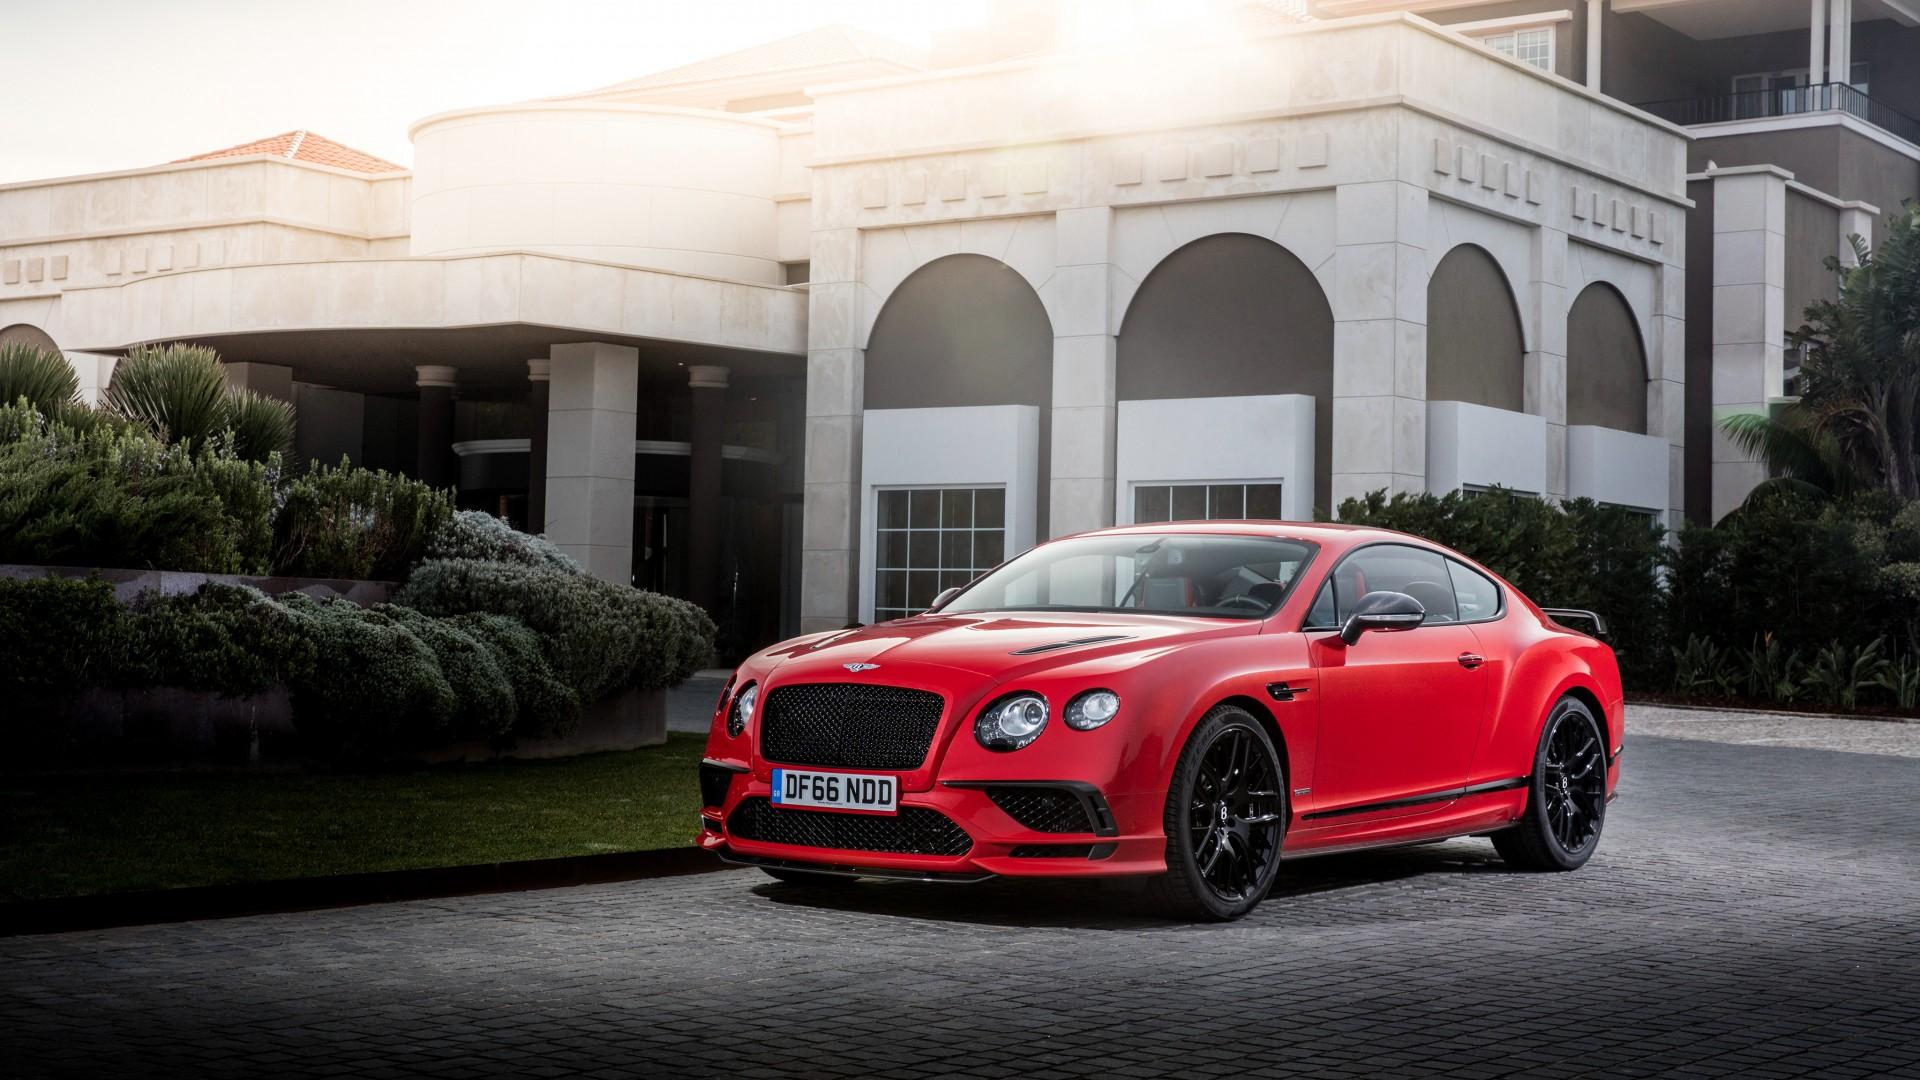 Bentley Continental Supersports 2017 4k Wallpaper Hd Car